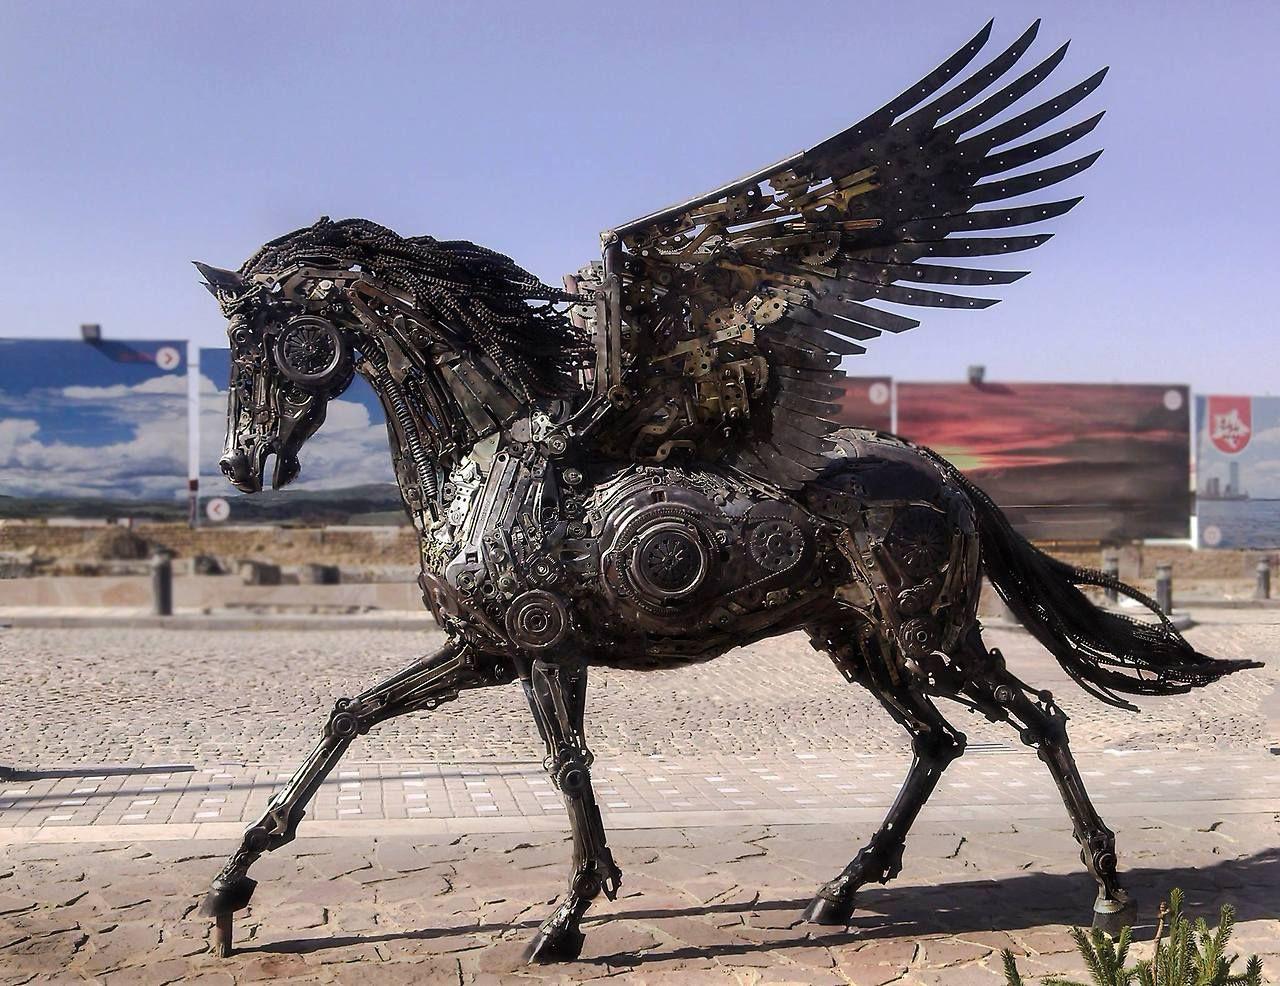 Art fairs mechanical movement metal paris russia sculptures wood - Explore Horse Sculpture Animal Sculptures And More